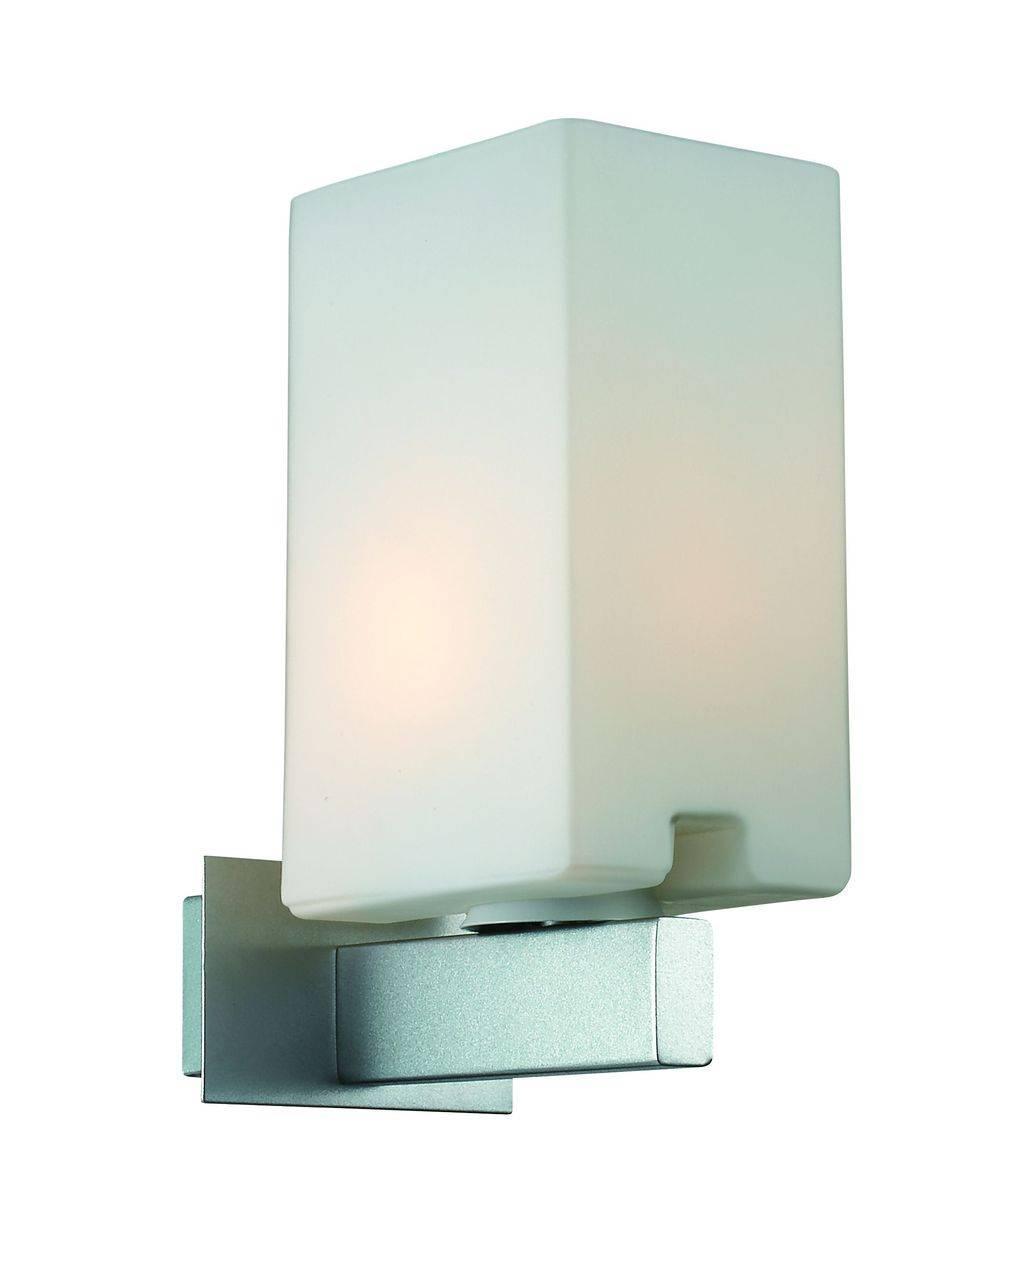 Бра ST Luce Caset SL541.101.01 бра st luce curiosita sl270 401 01